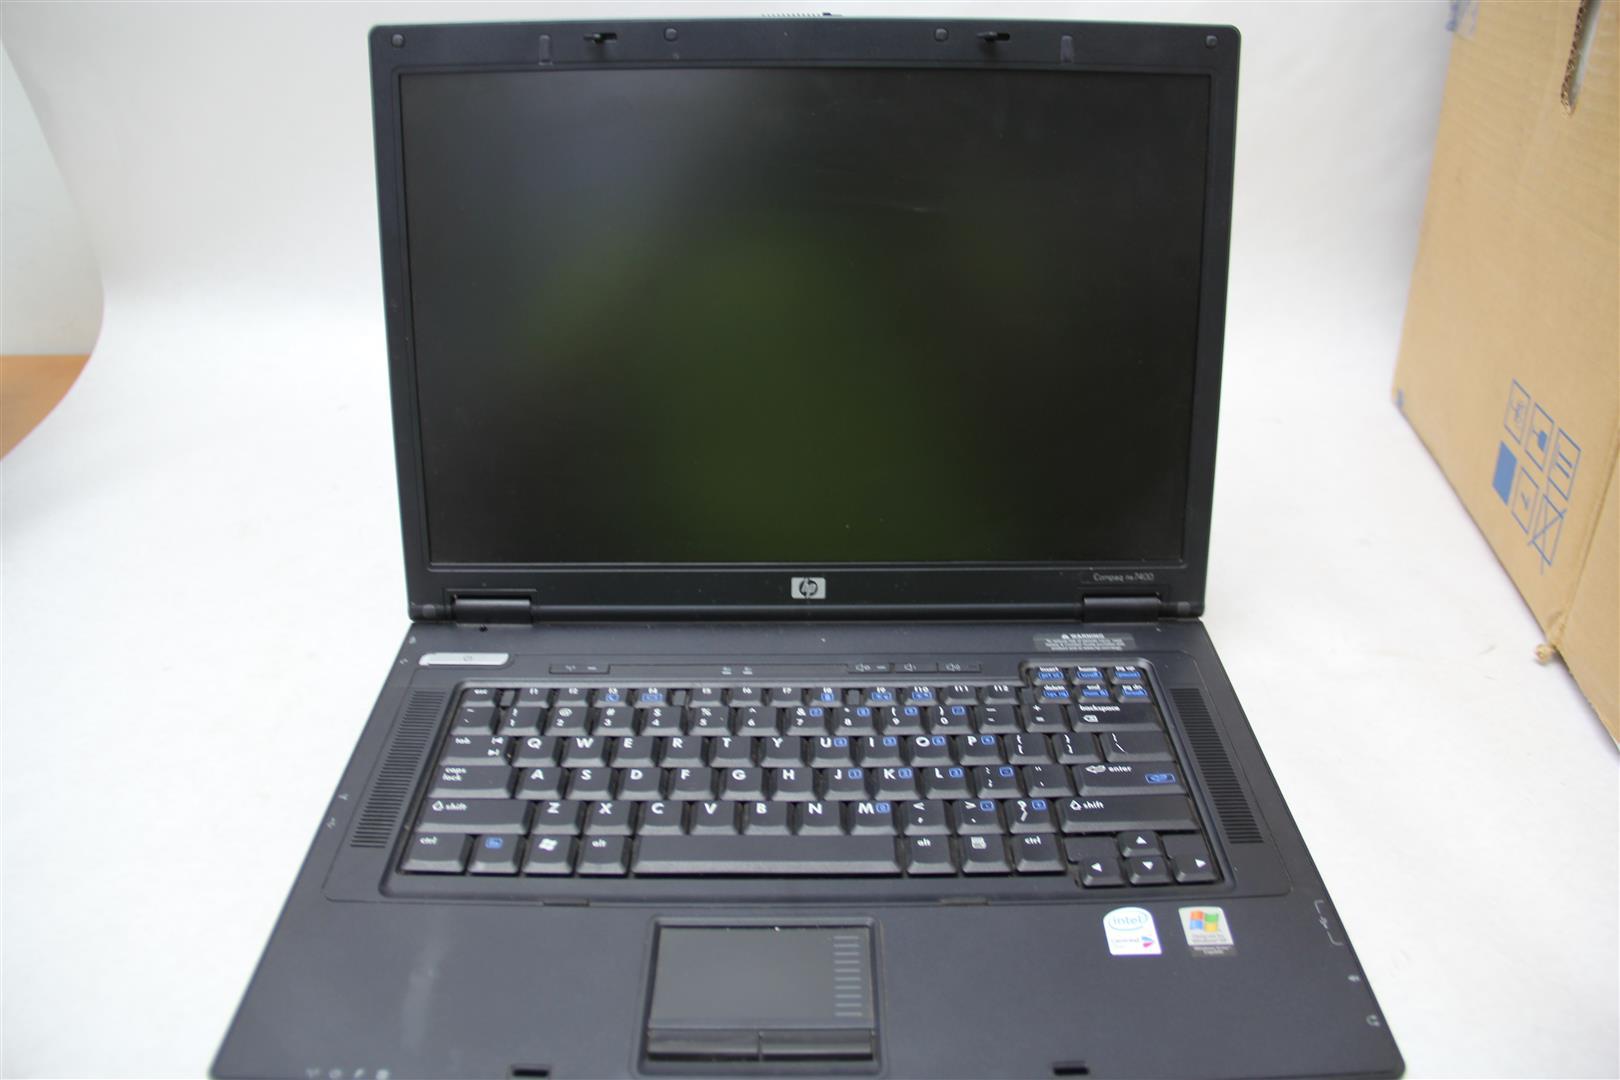 Compaq nx7400 ram slots